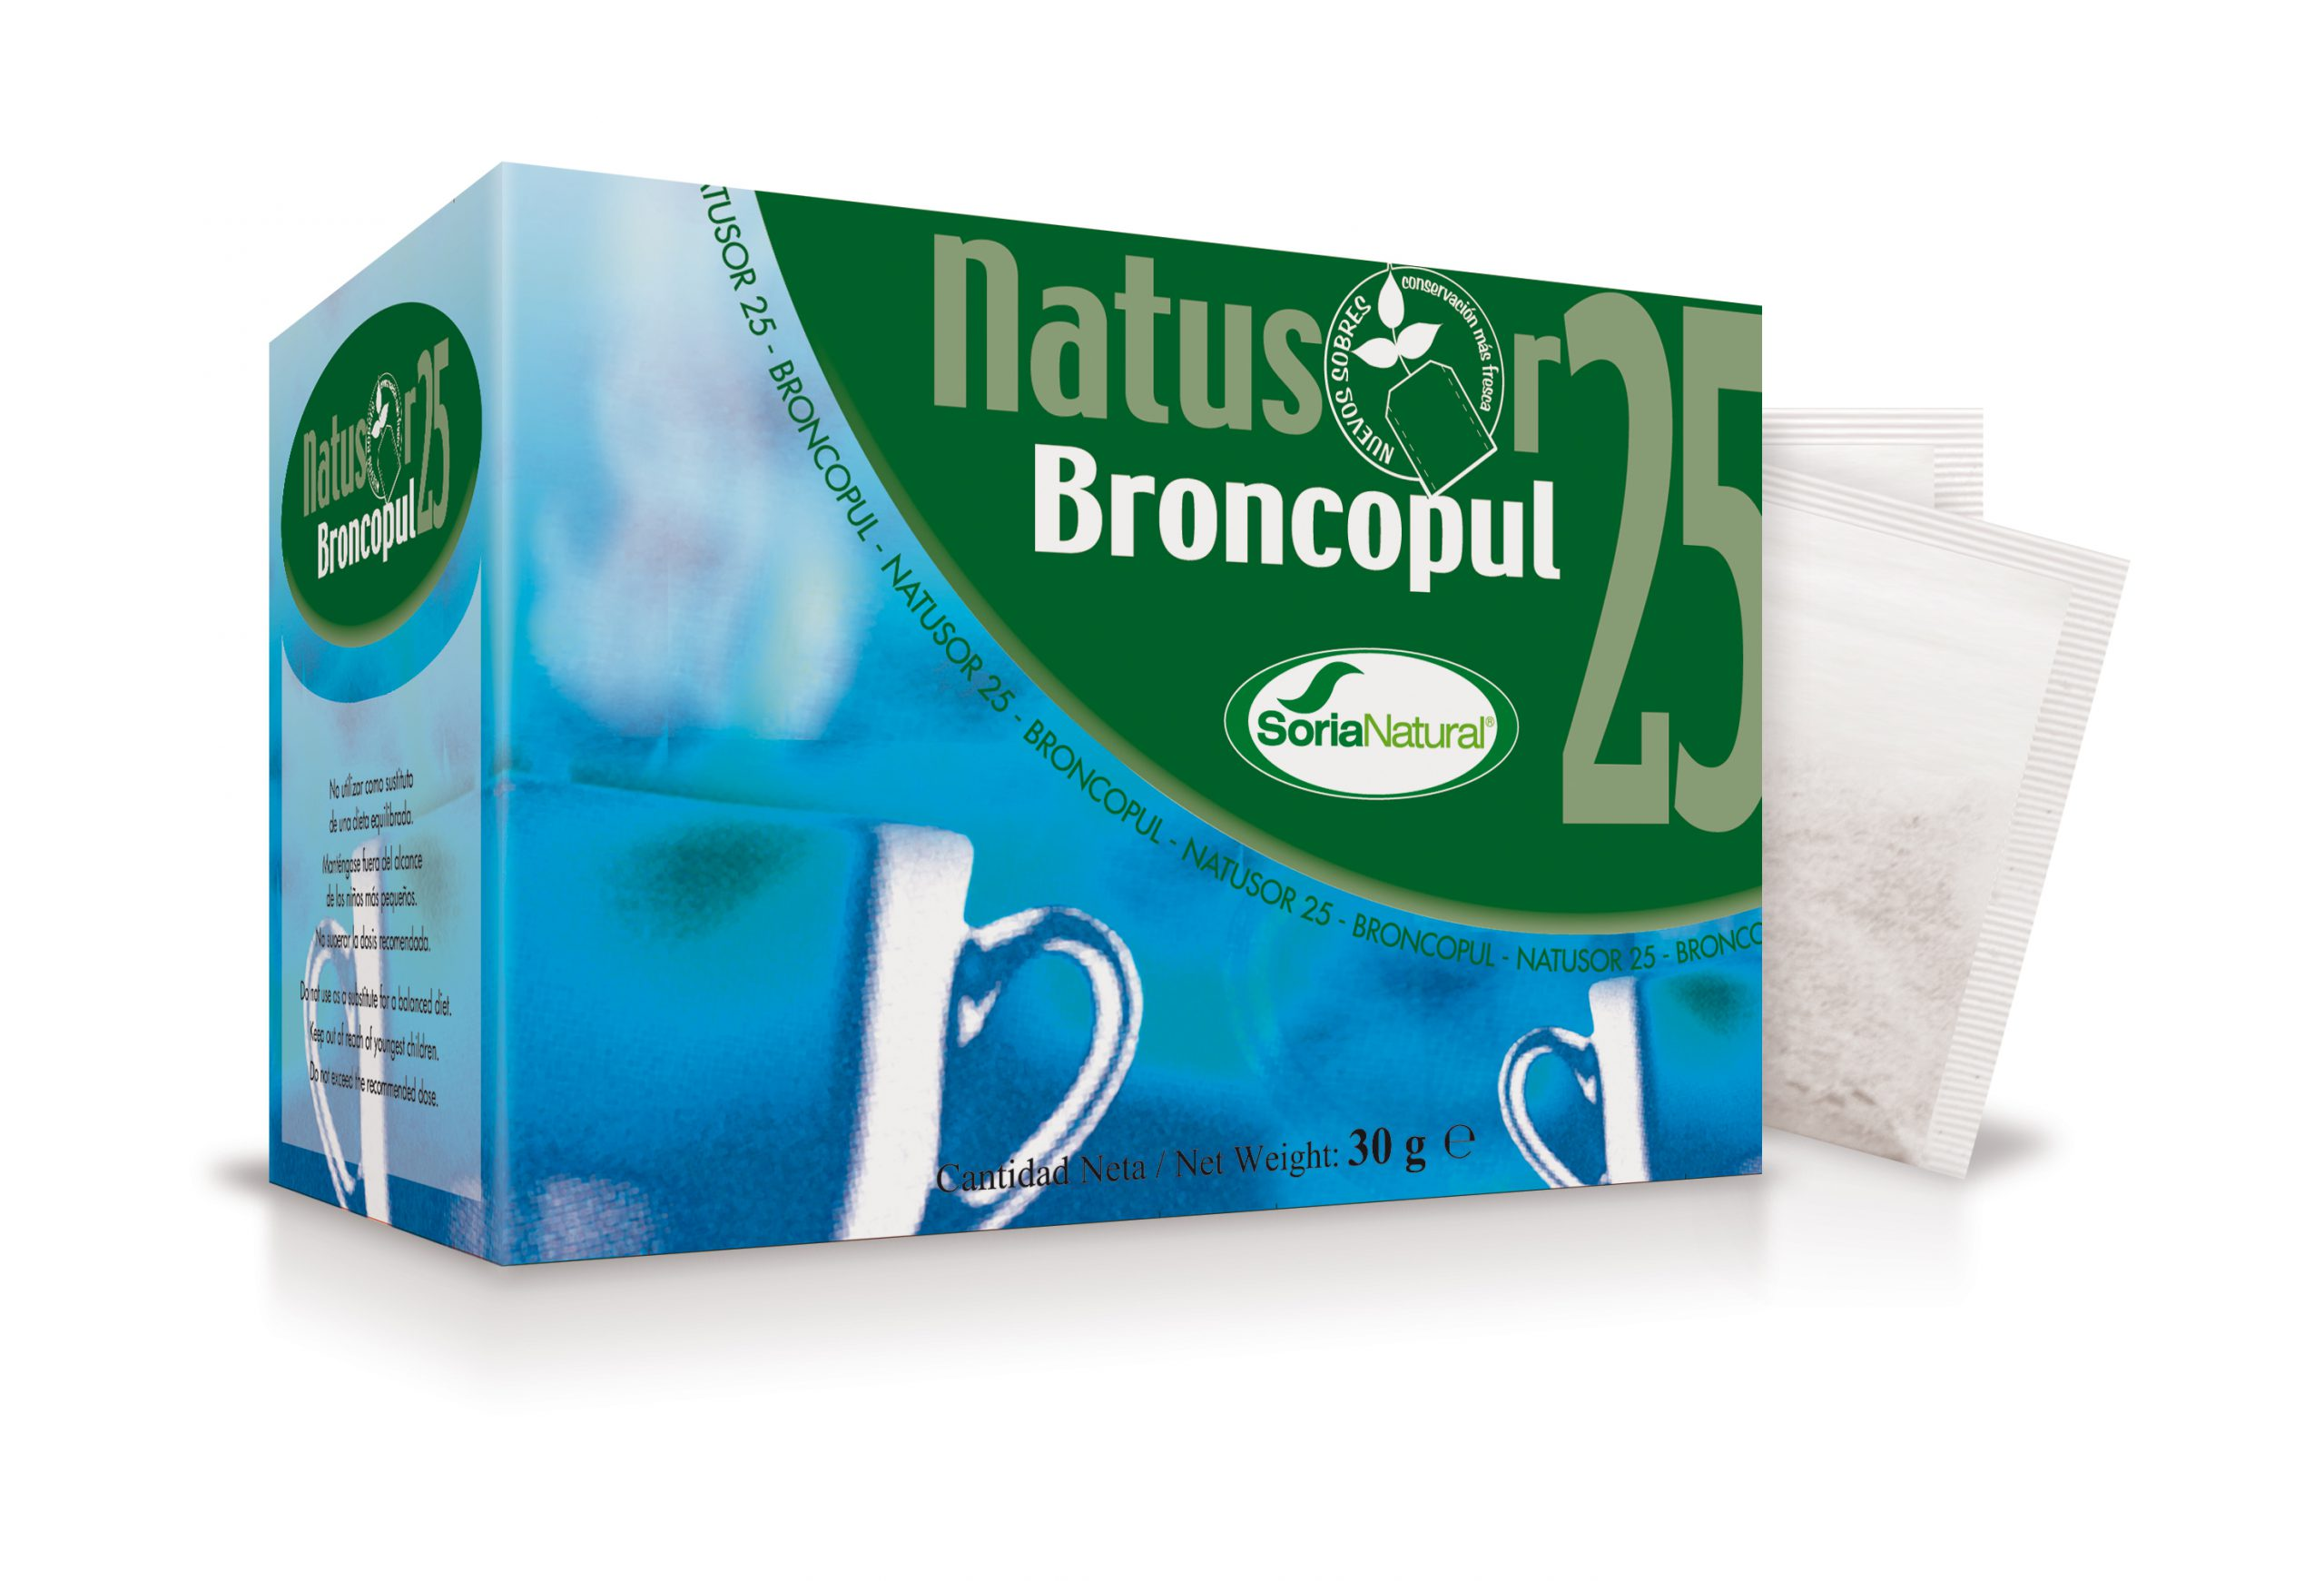 Natusor 25 Broncopul